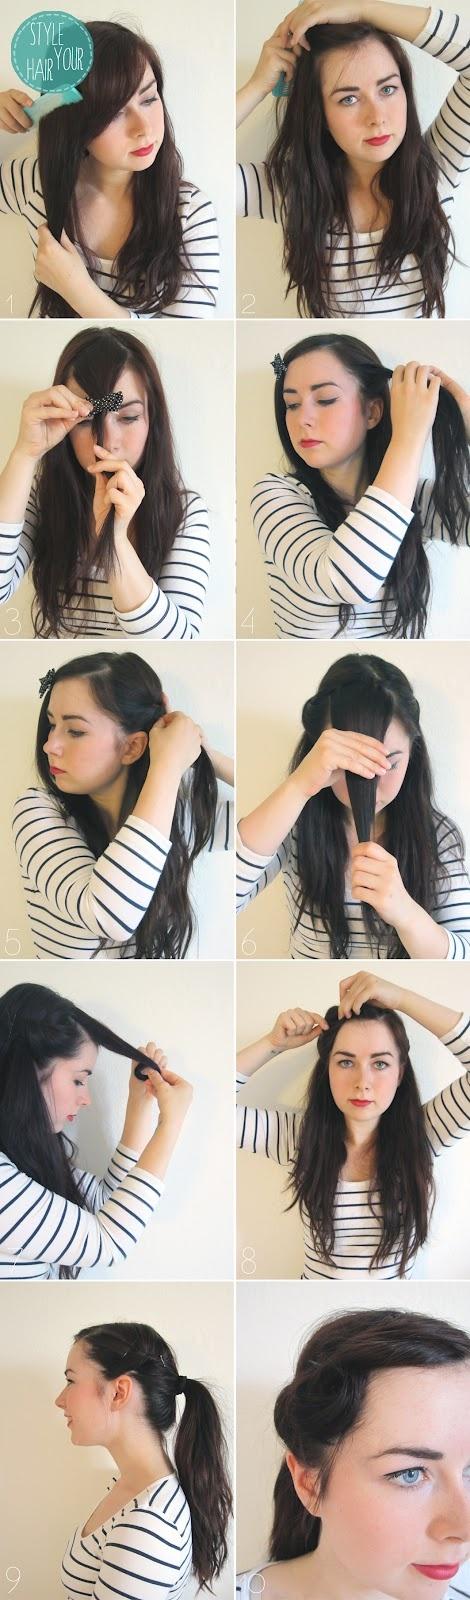 Style your hair. 50s hairdo tutorial.